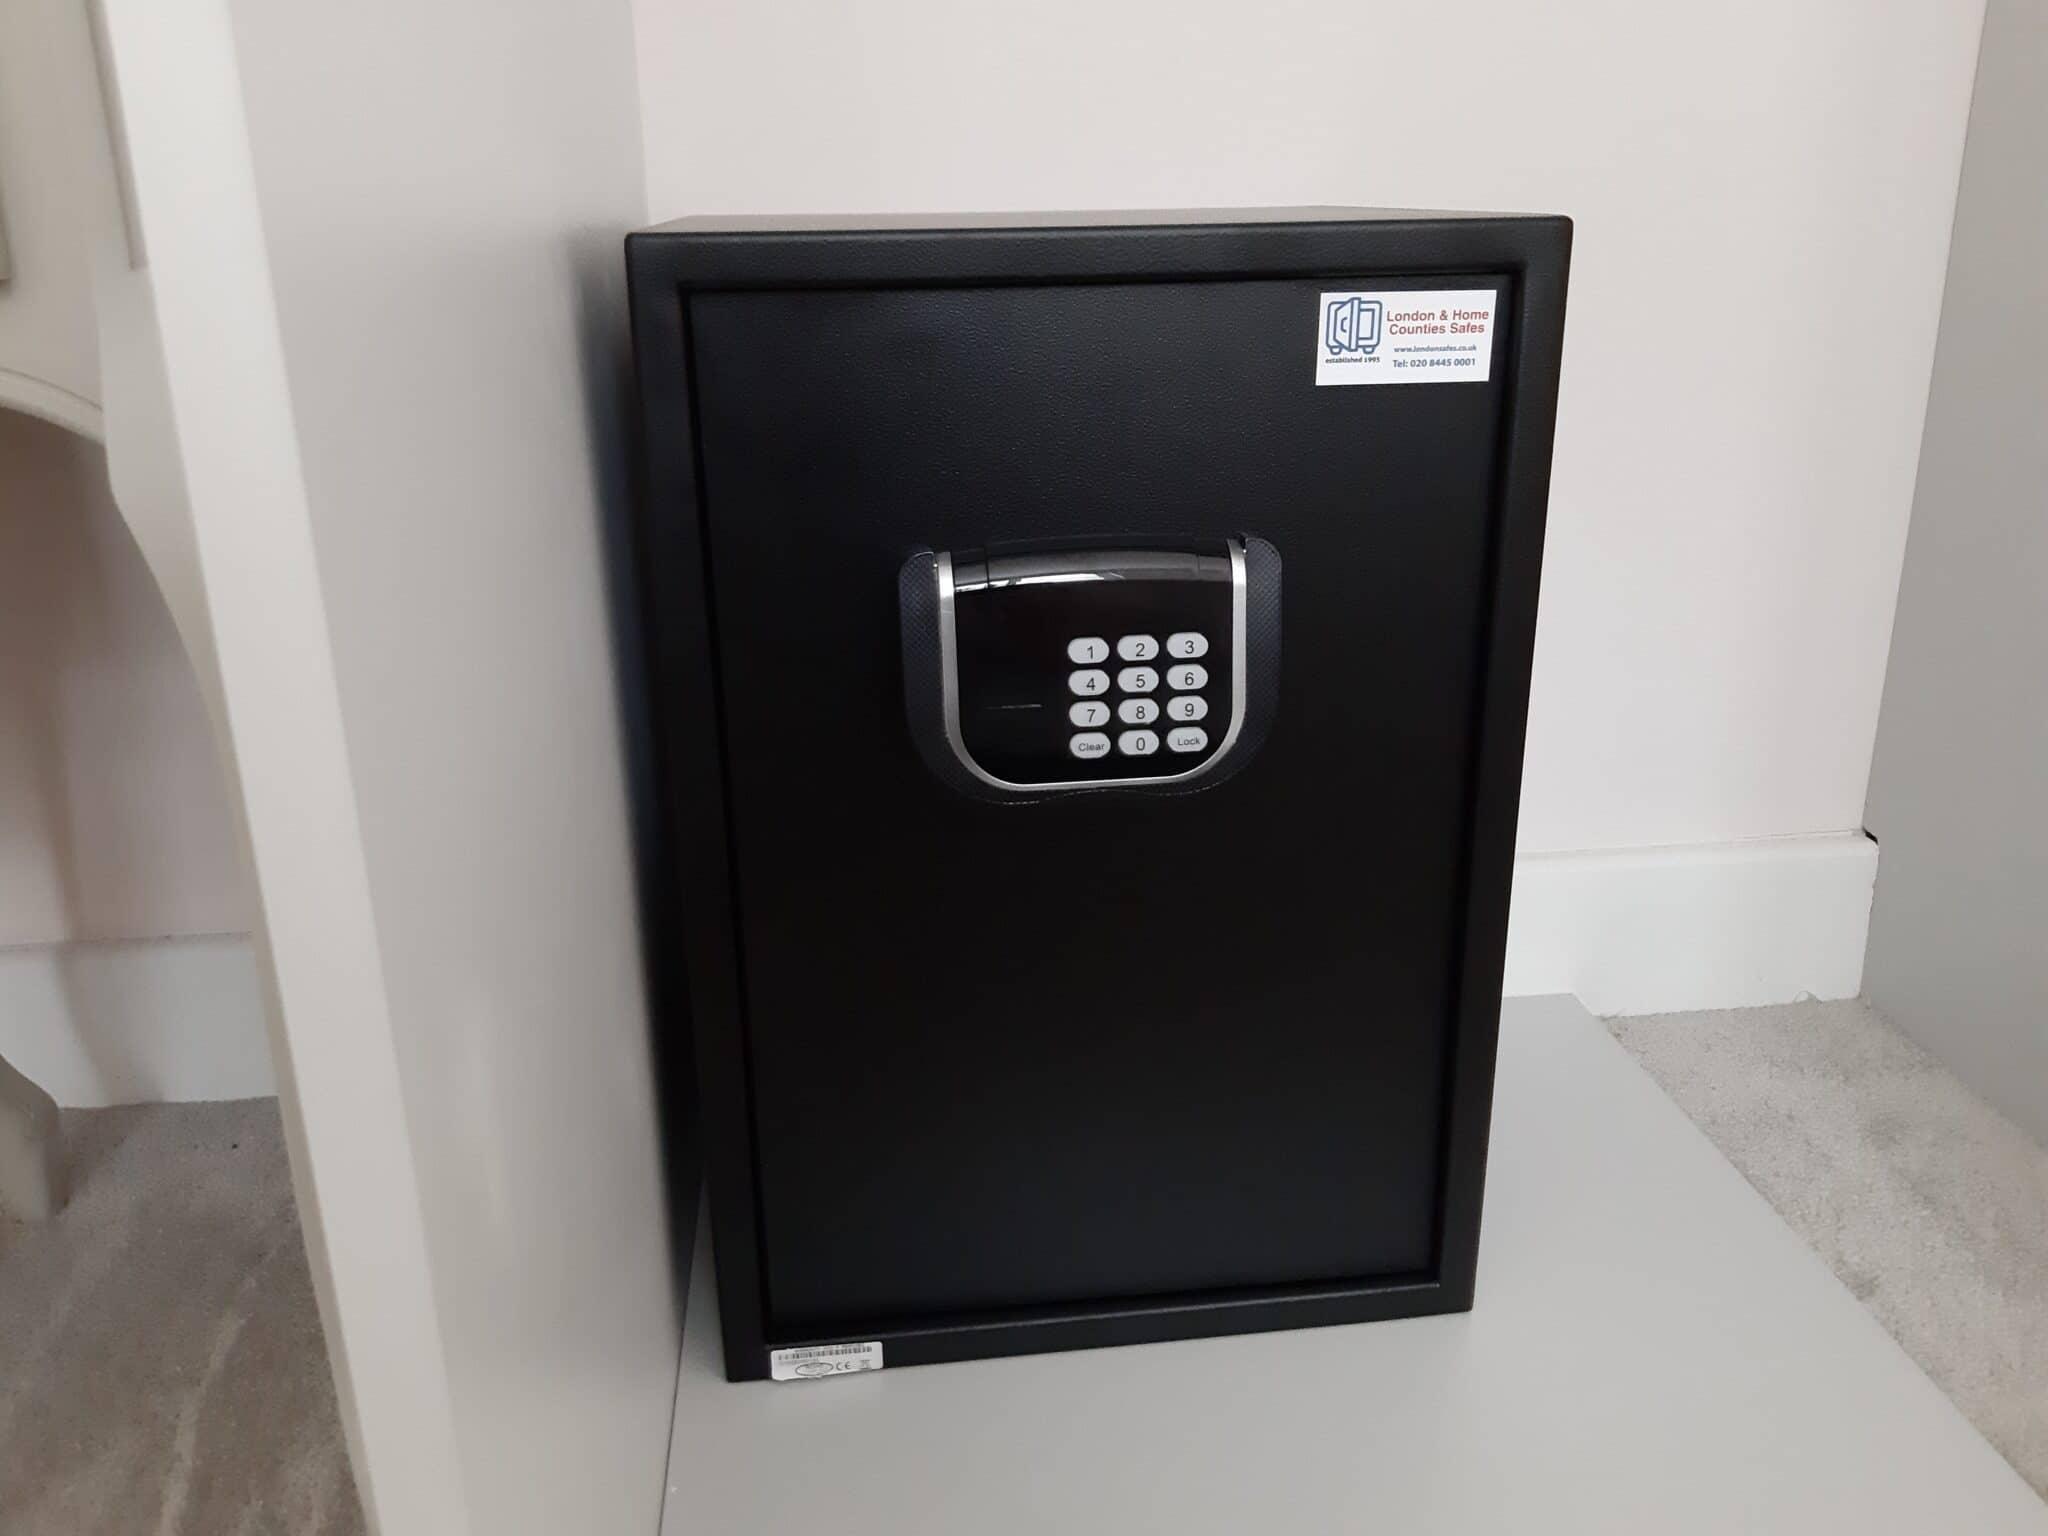 Pimlico Size 3 Digital Safe